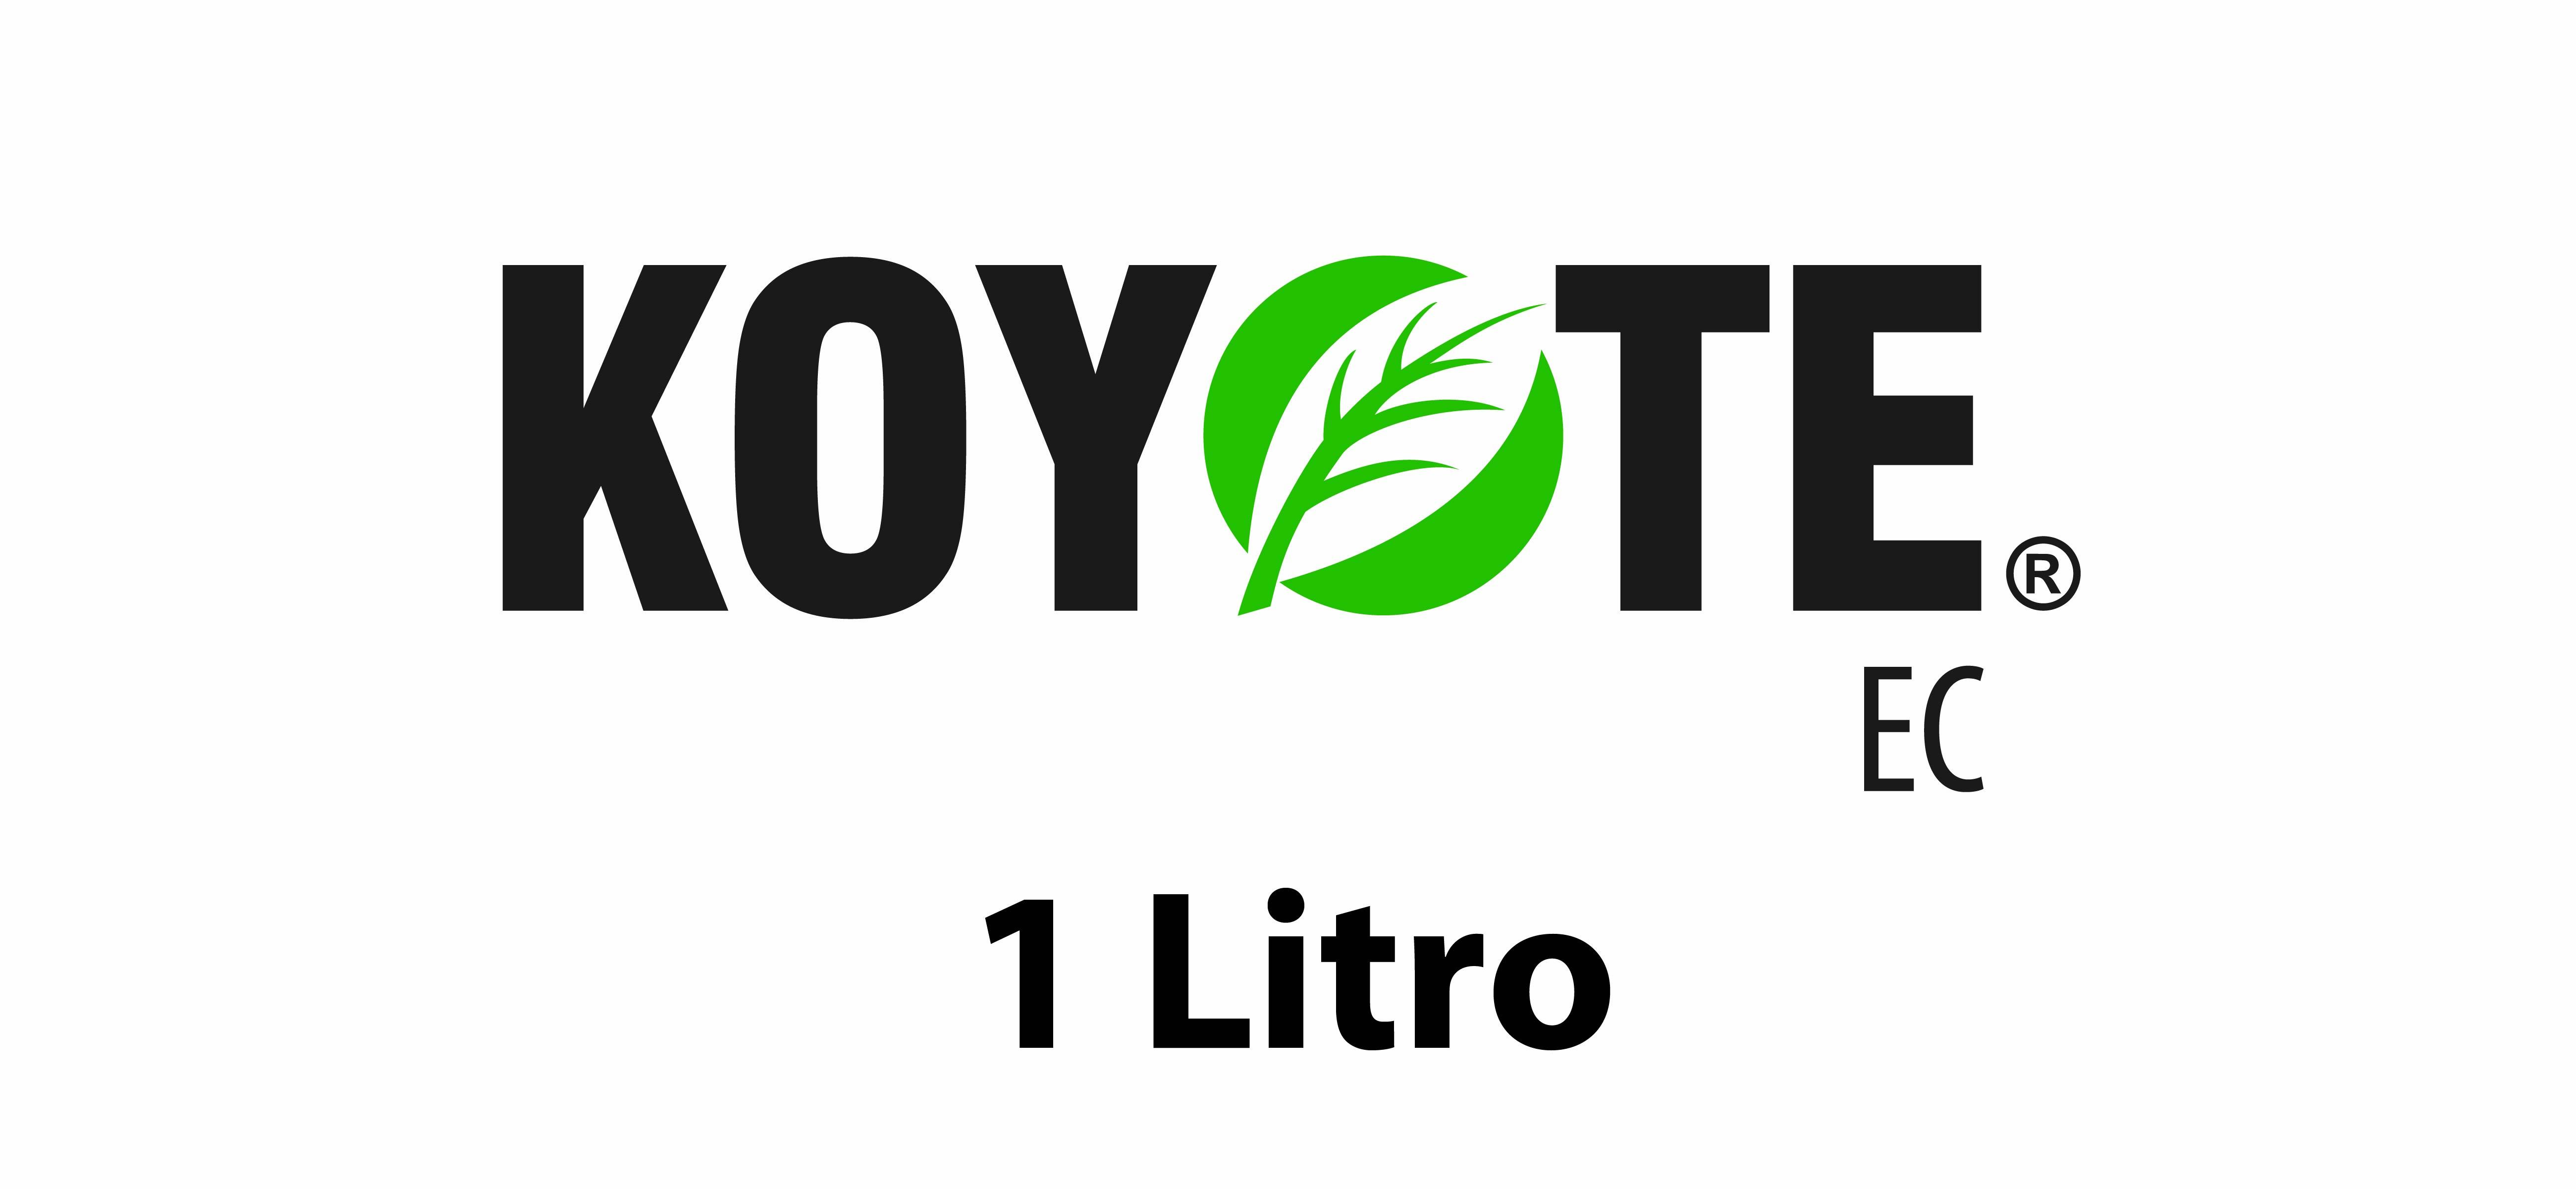 Koyote 1L.jpg